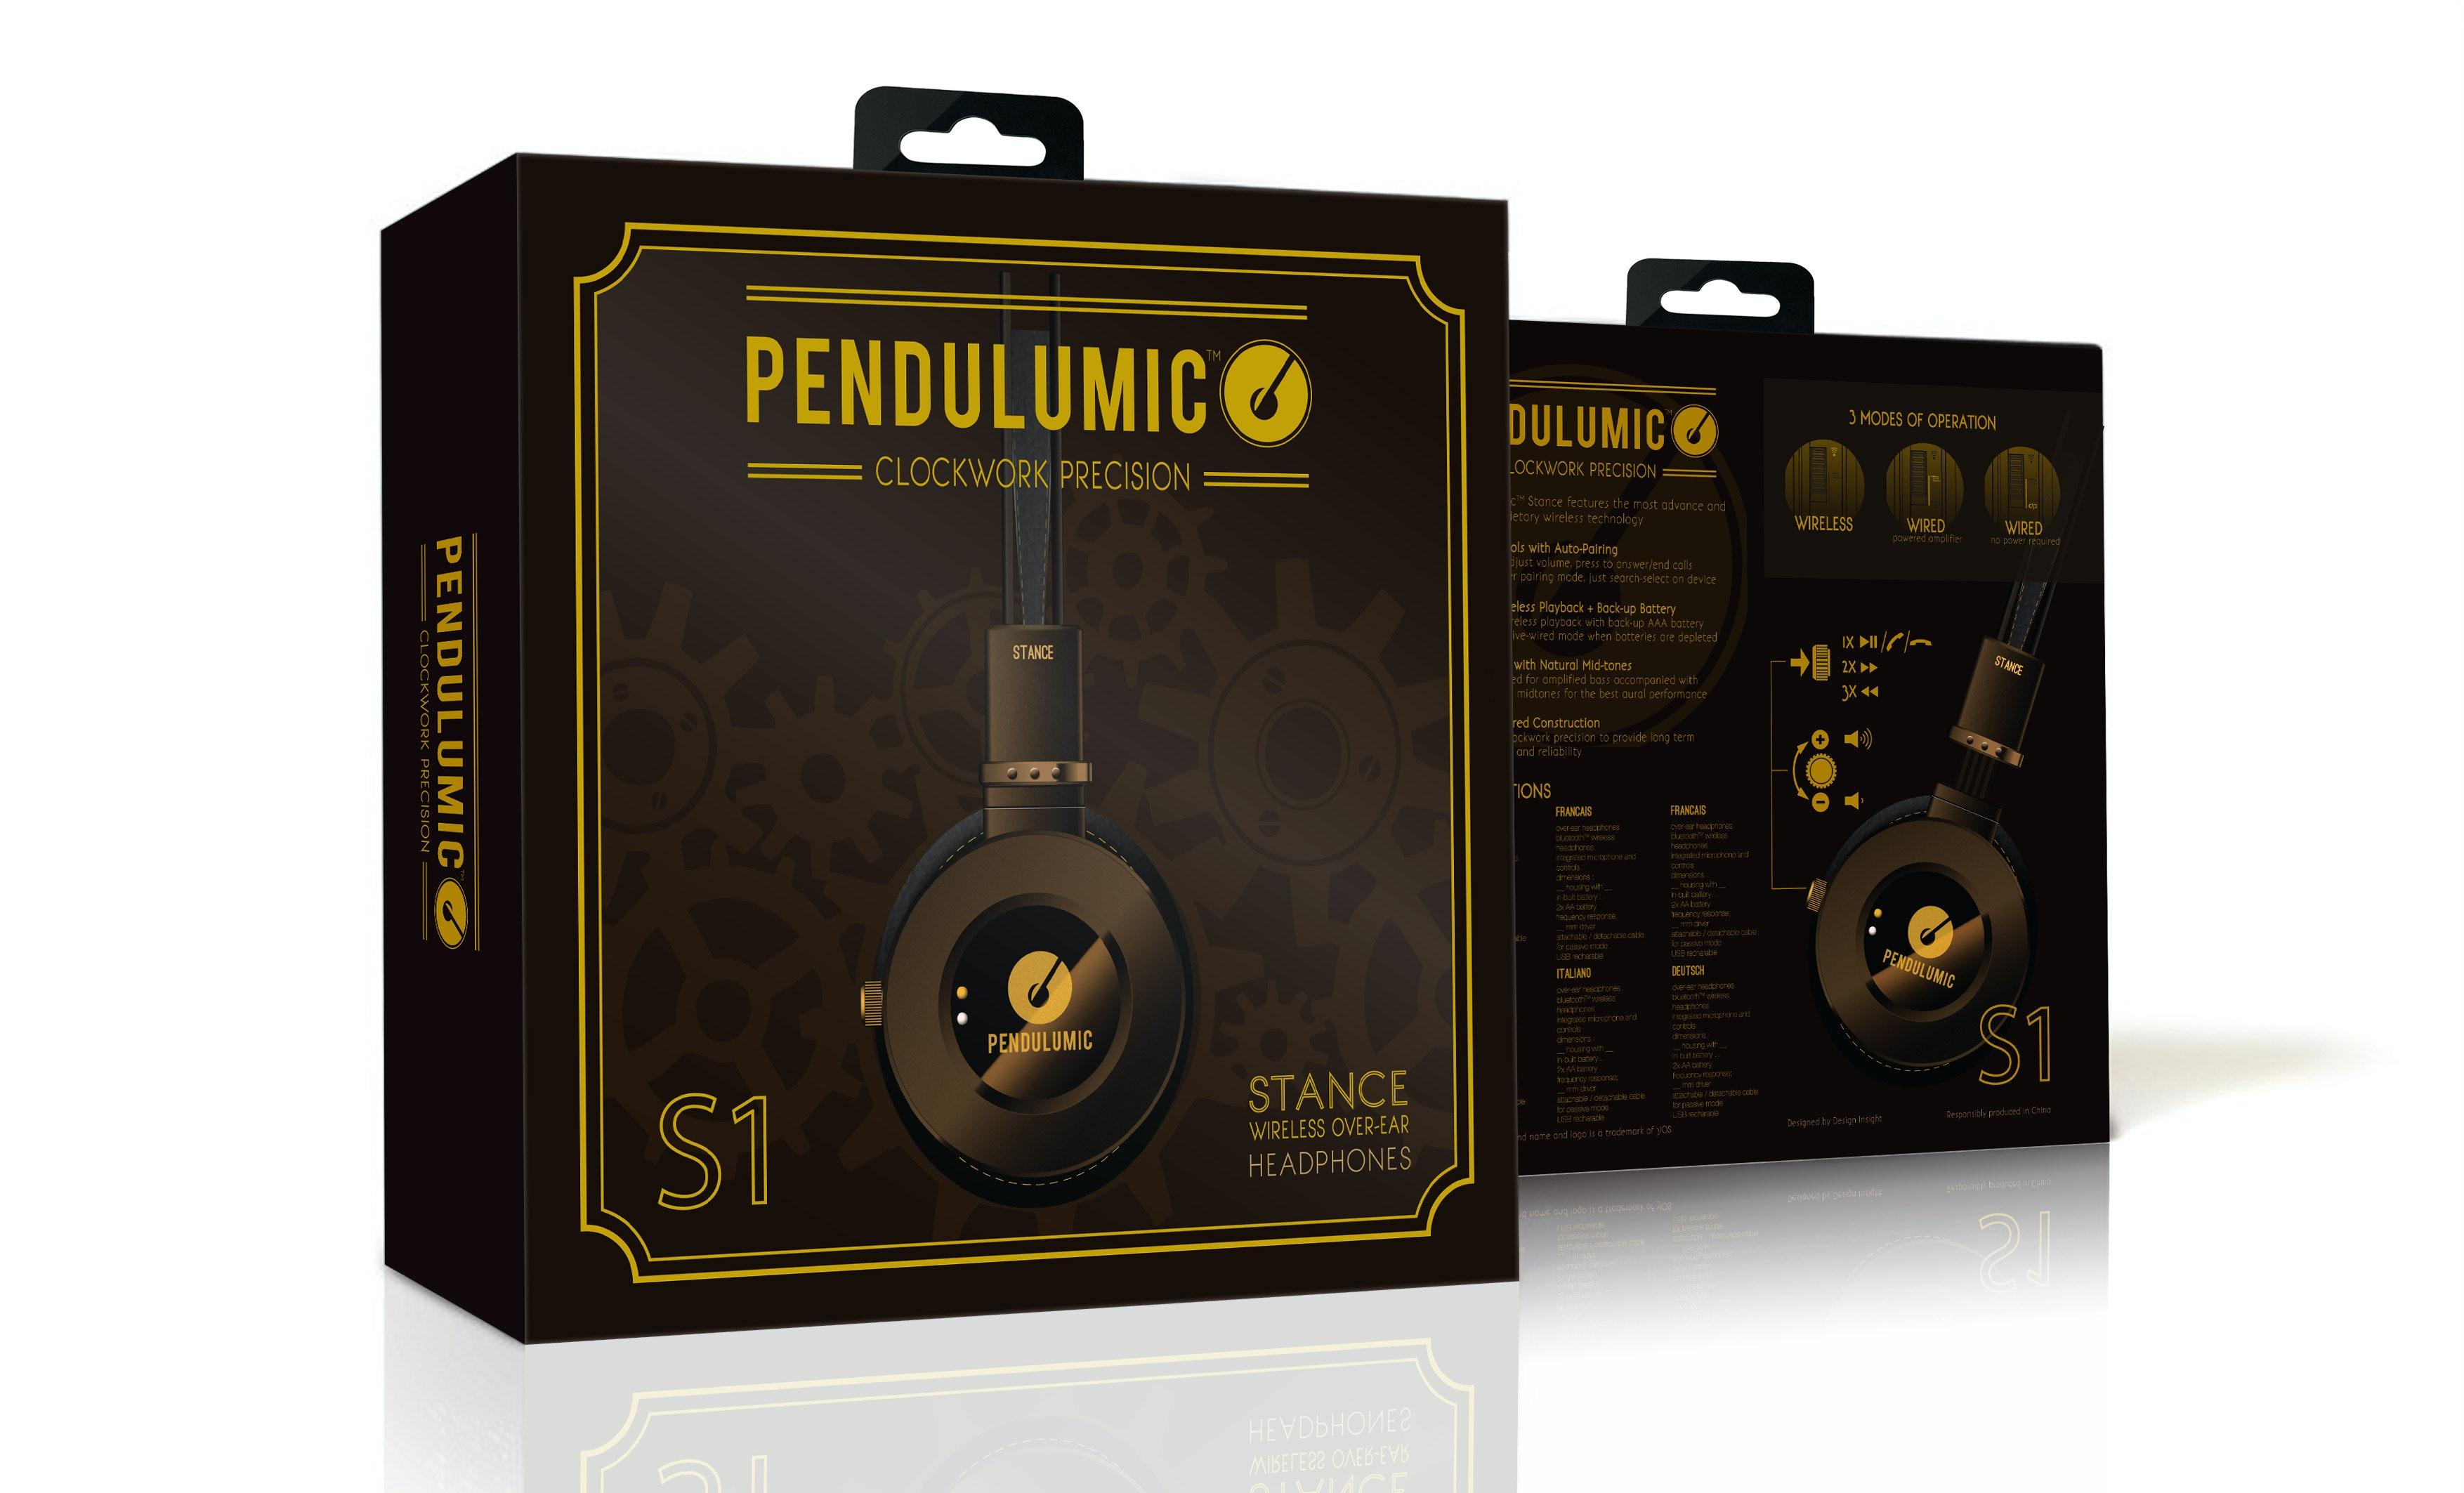 Pendulumic STANCE S1 Bluetooth Headphones